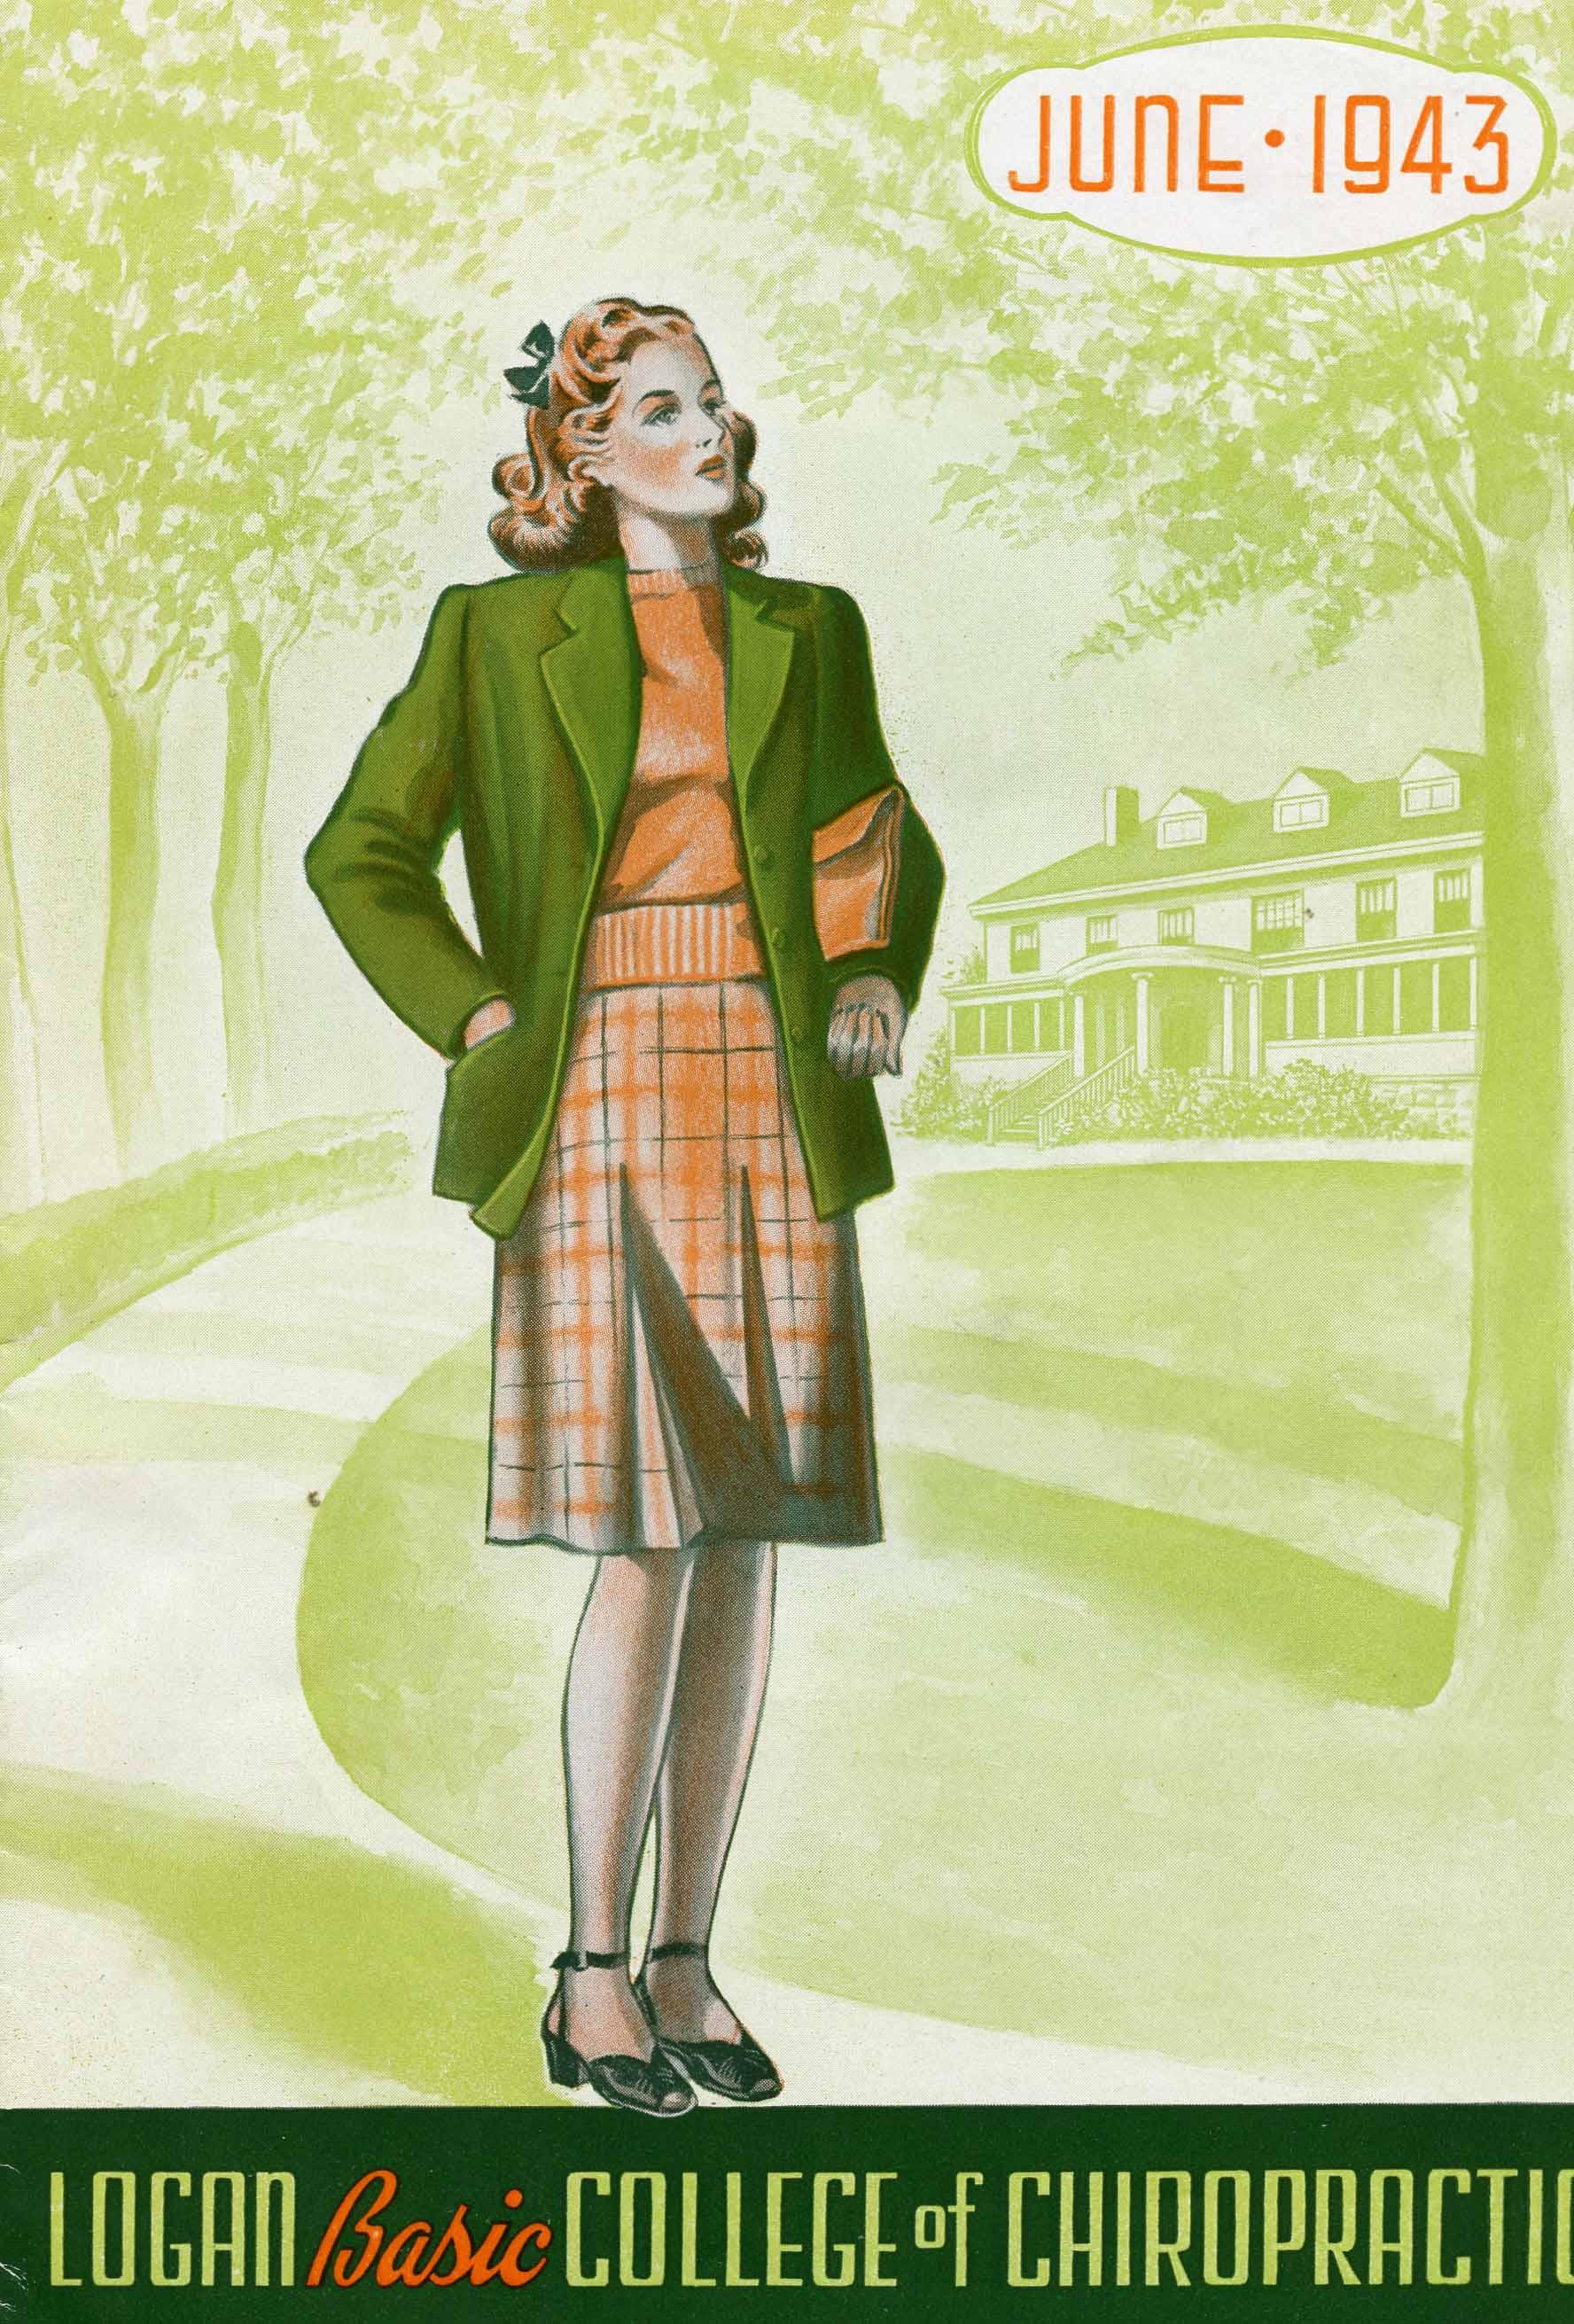 June 1943 catalog cover